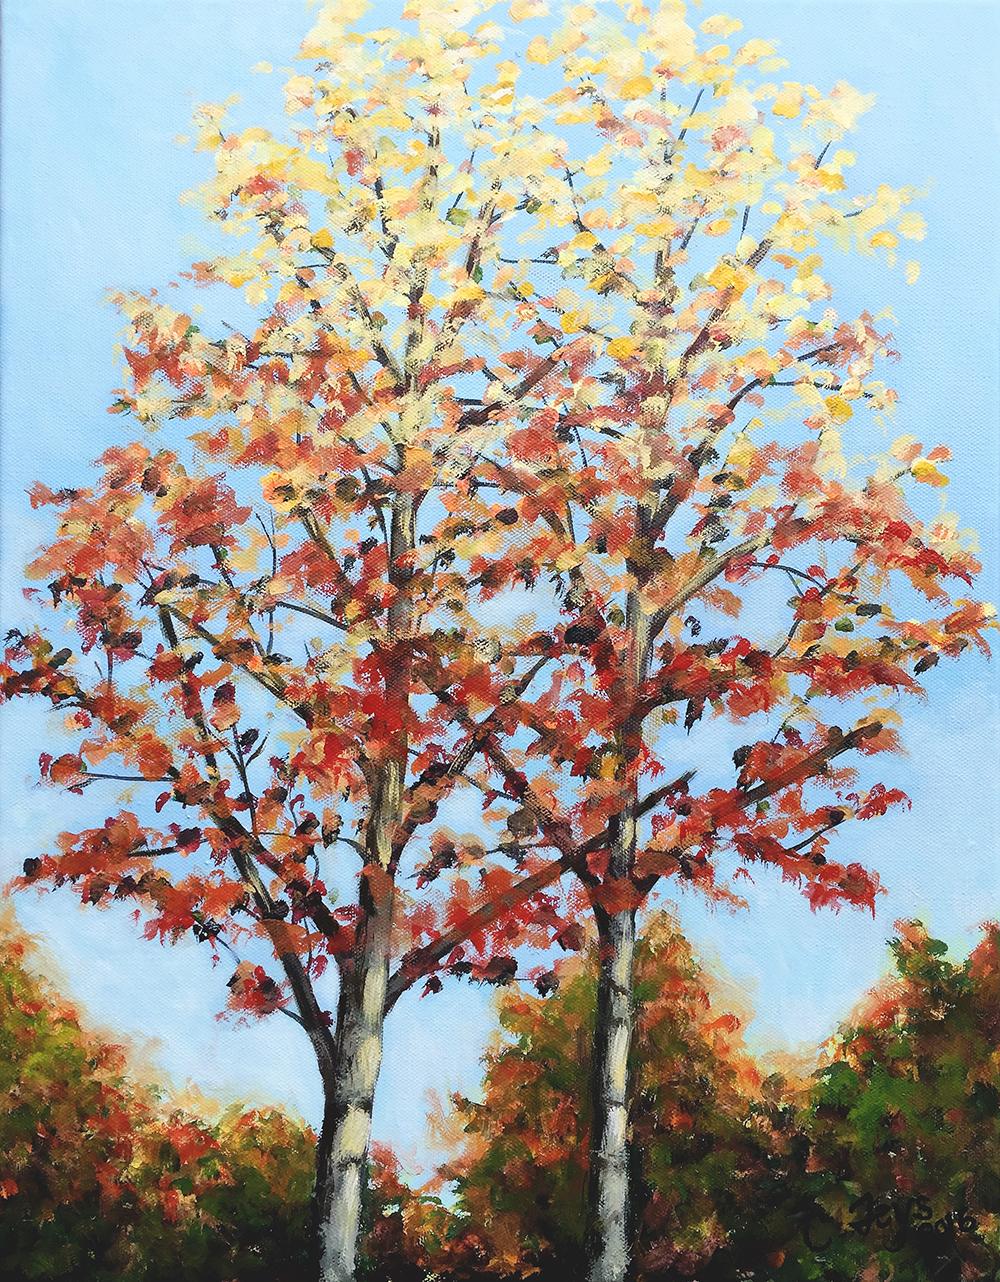 Fall Leaves, 2016